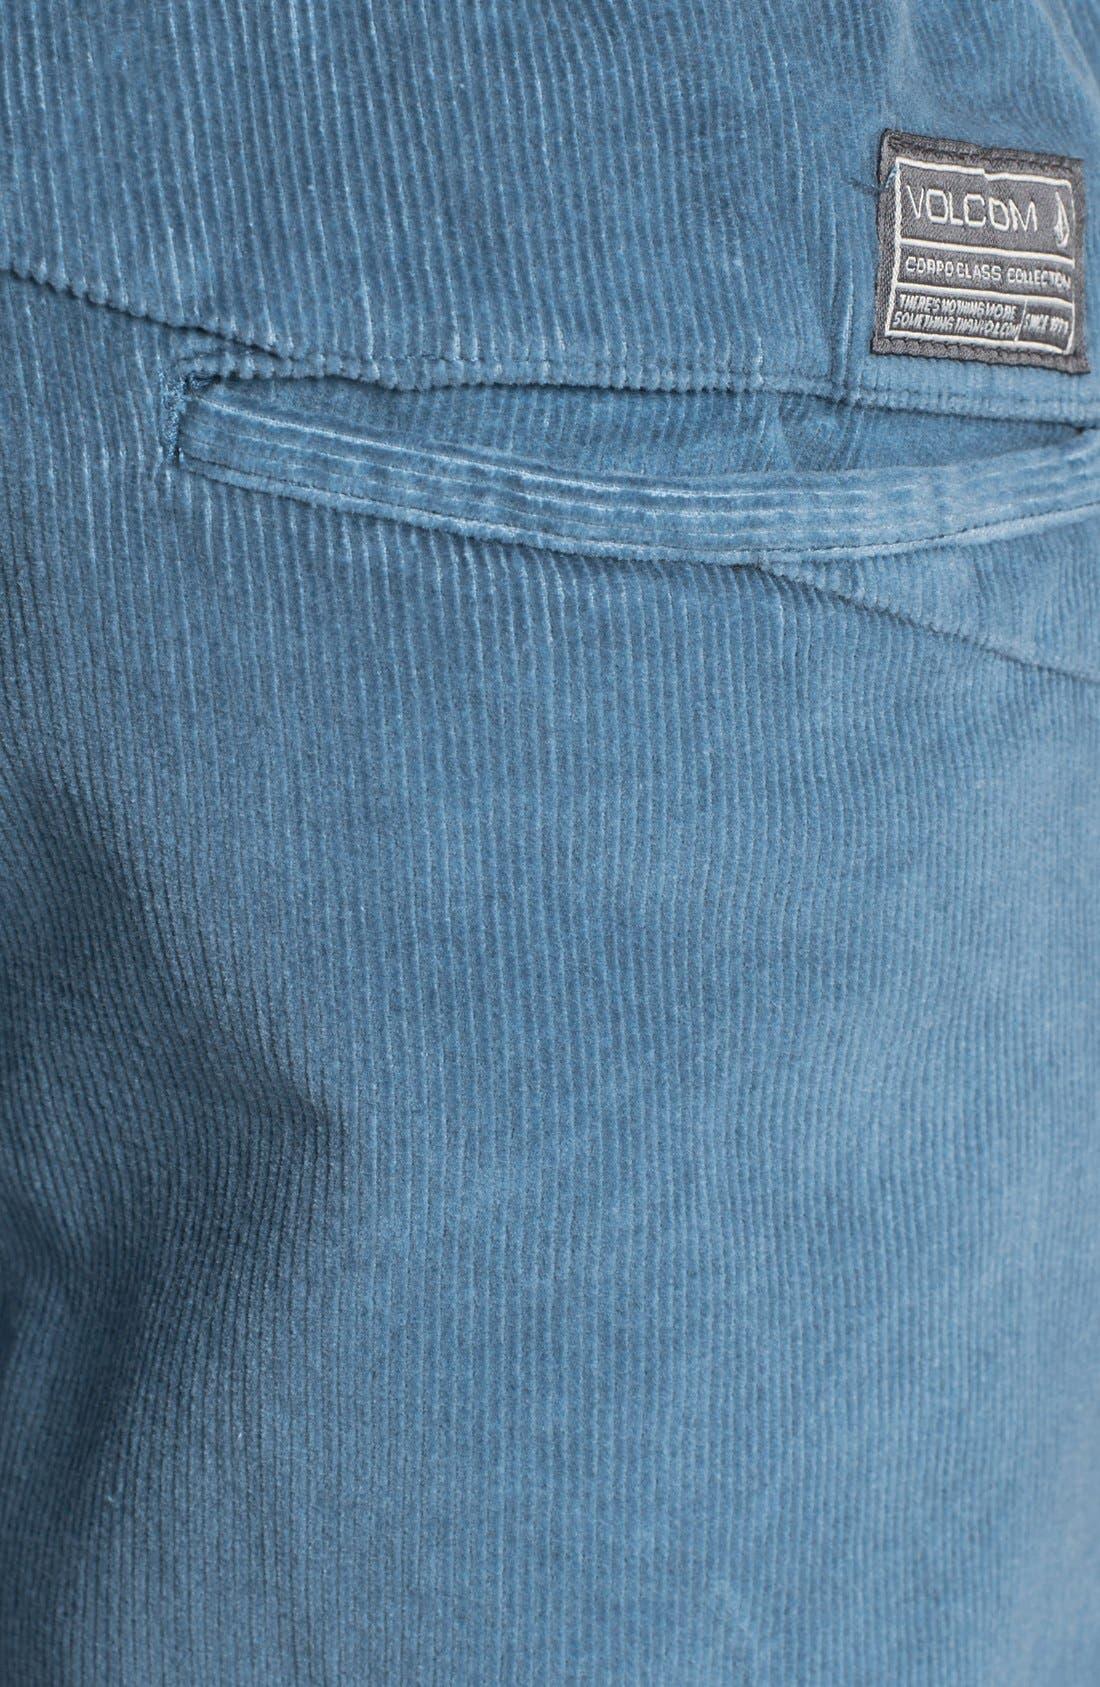 Alternate Image 3  - Volcom Elastic Waist Corduroy Shorts